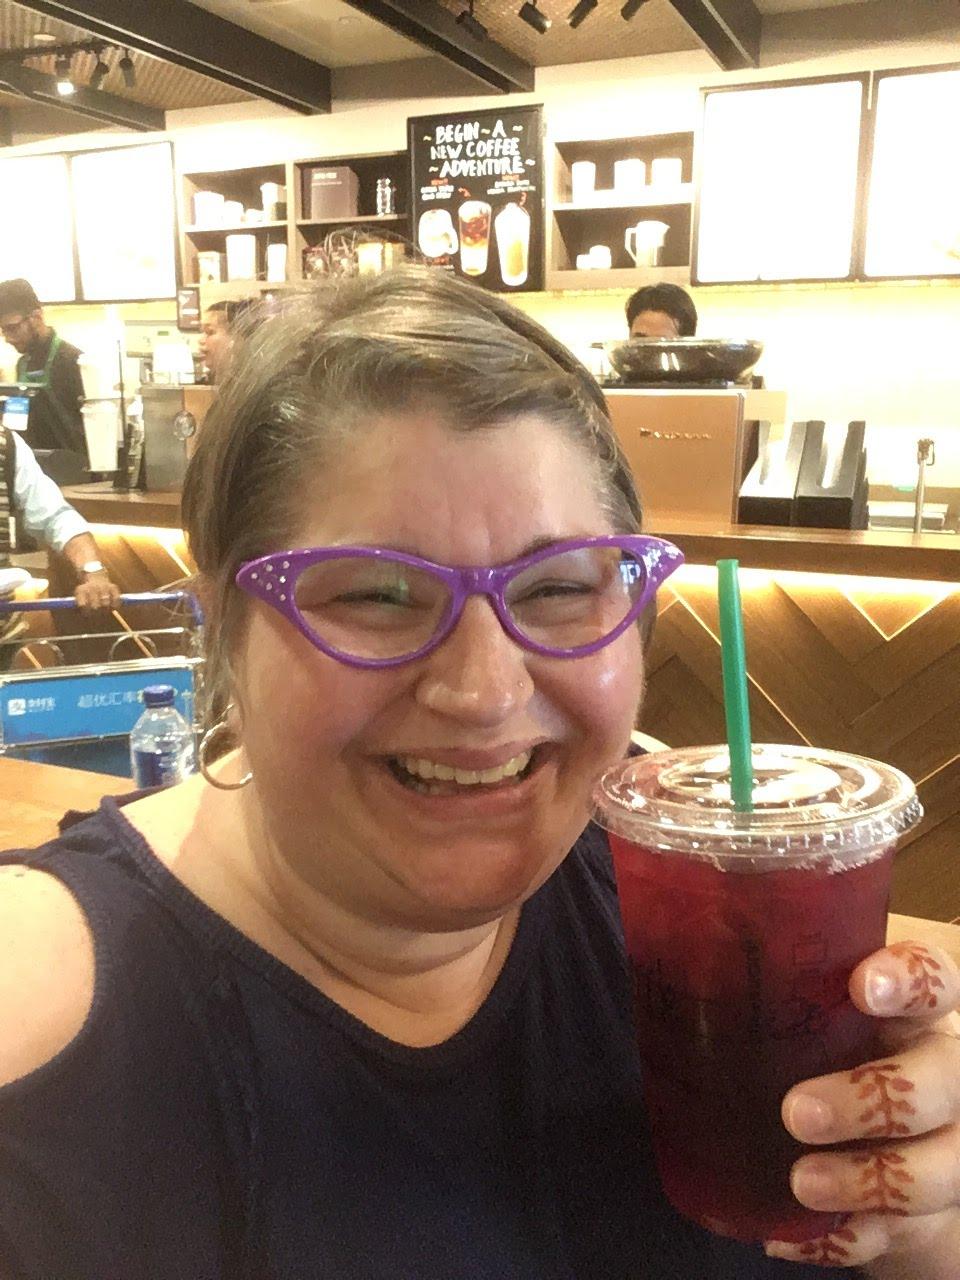 Starbucks, Singapore Airport, Passion Iced Tea, 2019